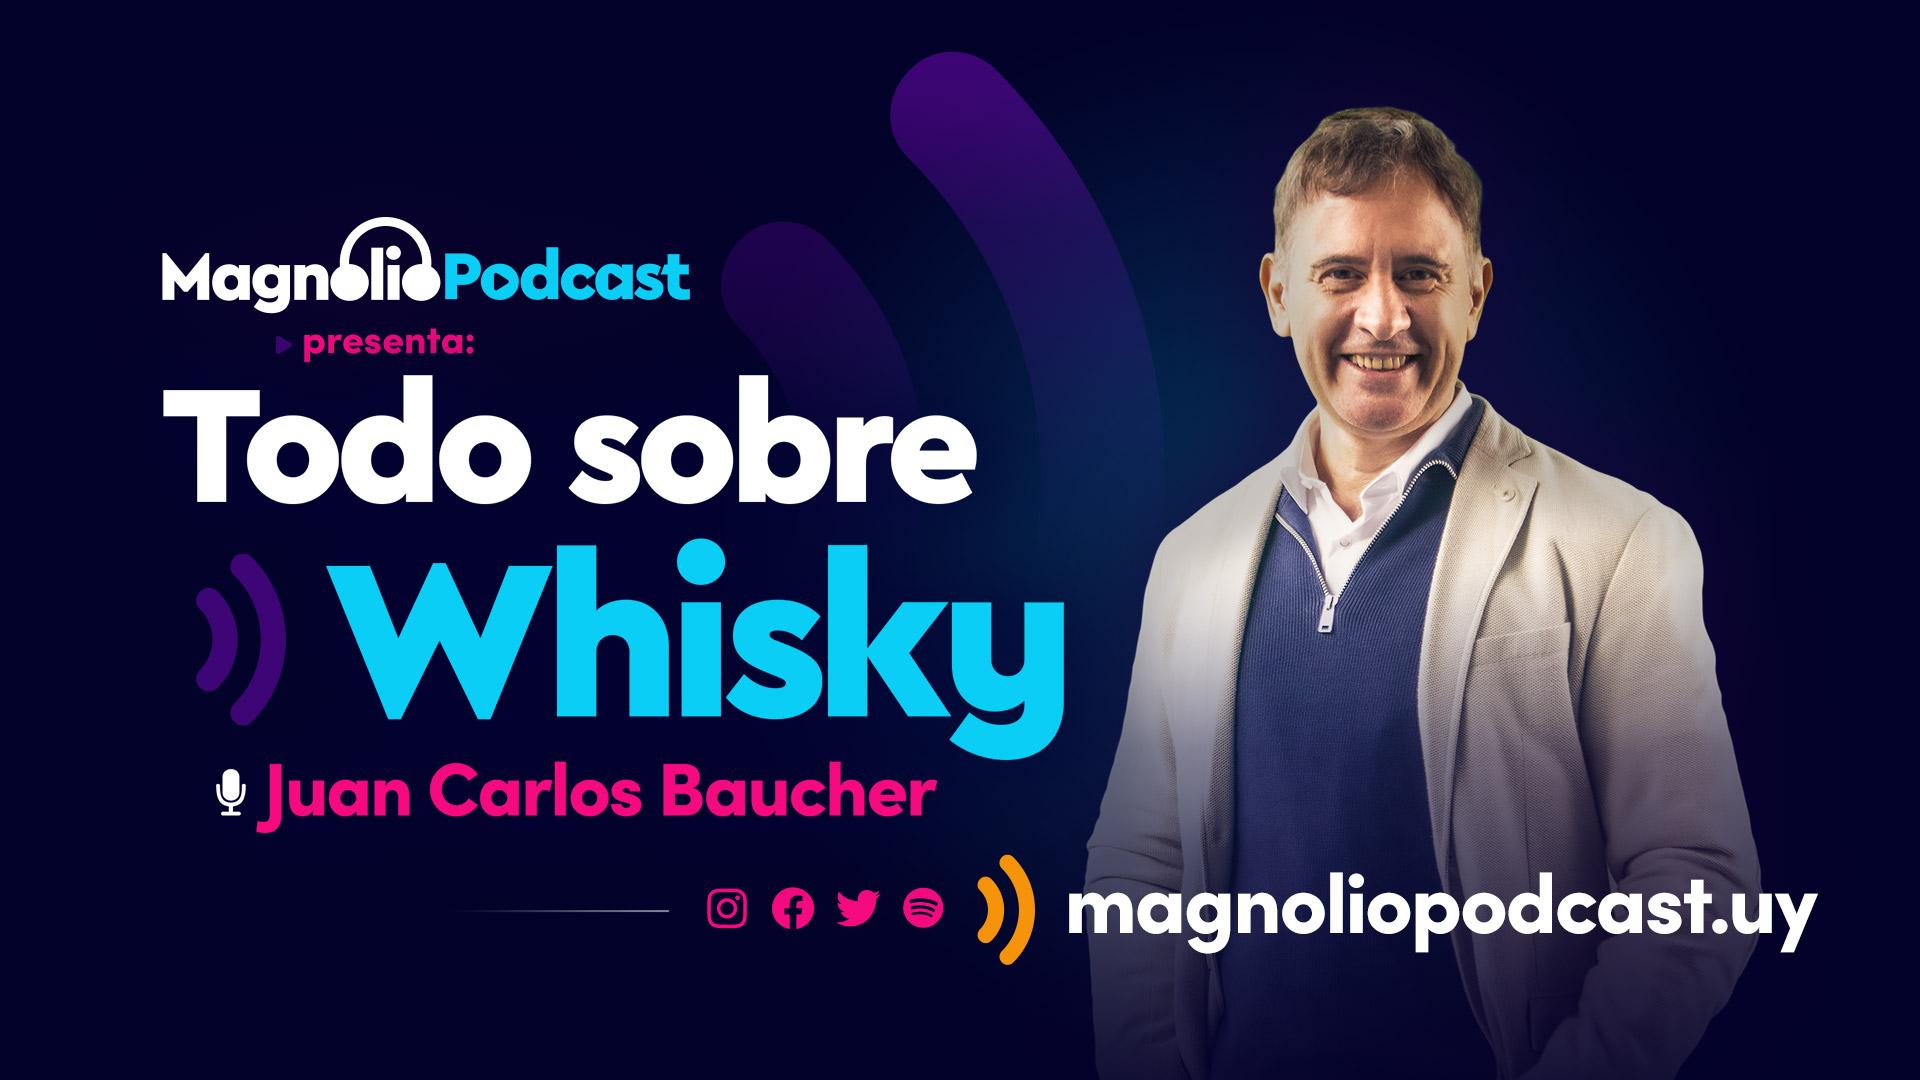 Todo sobre whisky - Juan Carlos Baucher